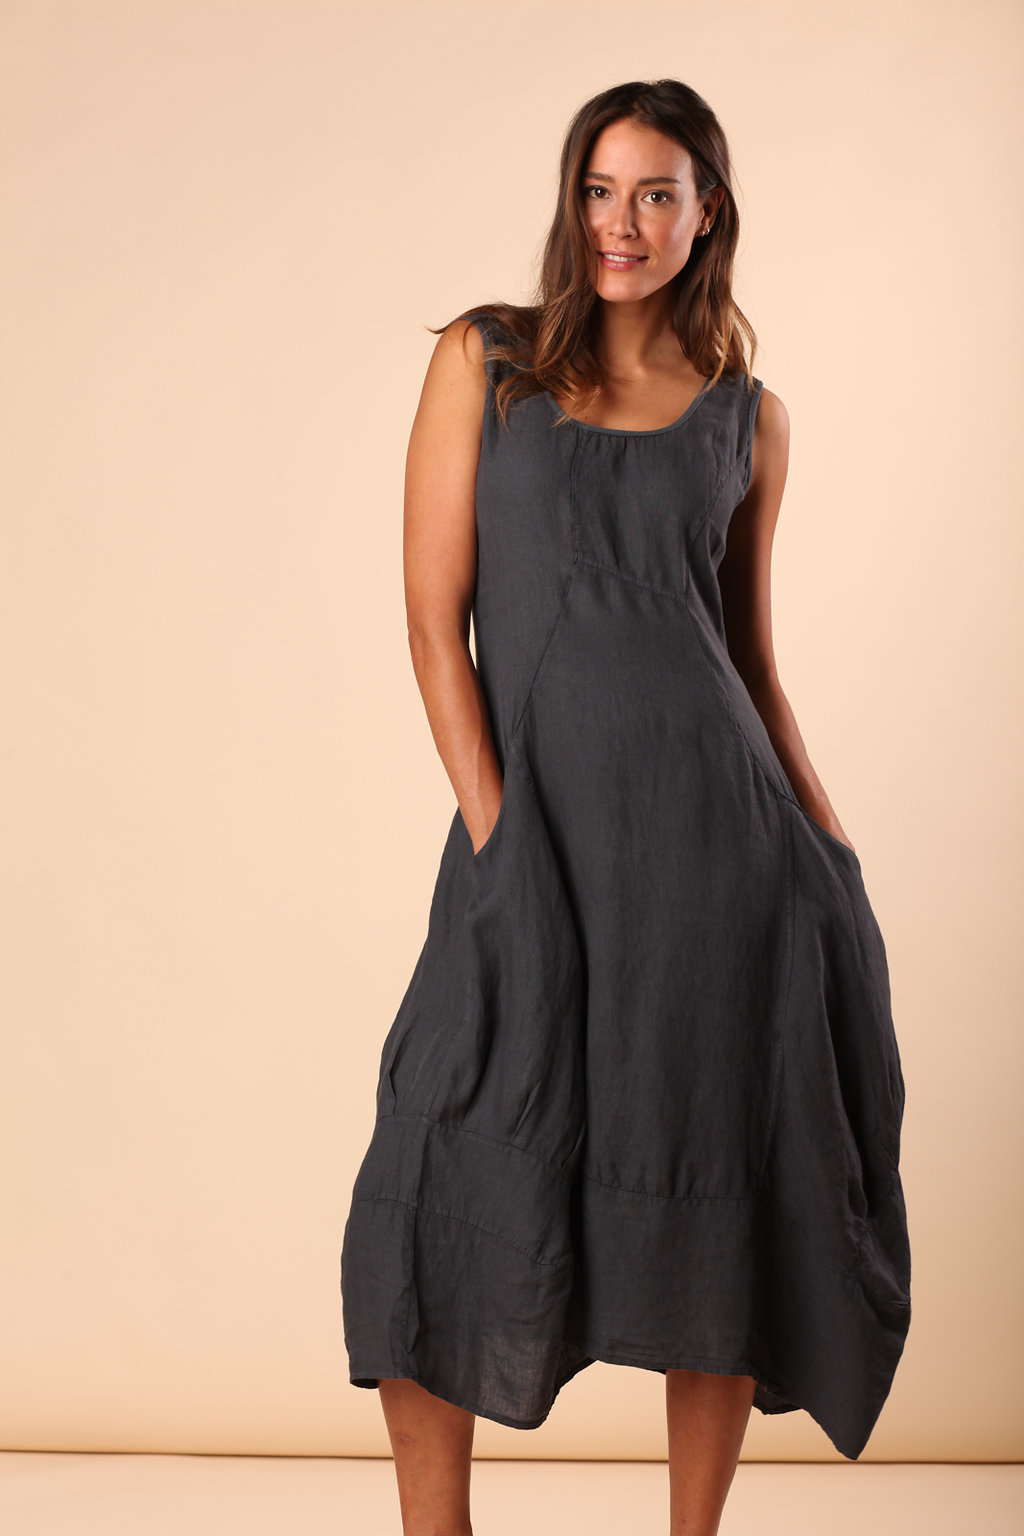 20c2d8edfe Inizio maxam agency canada jpg 1024x1536 Inizio clothing